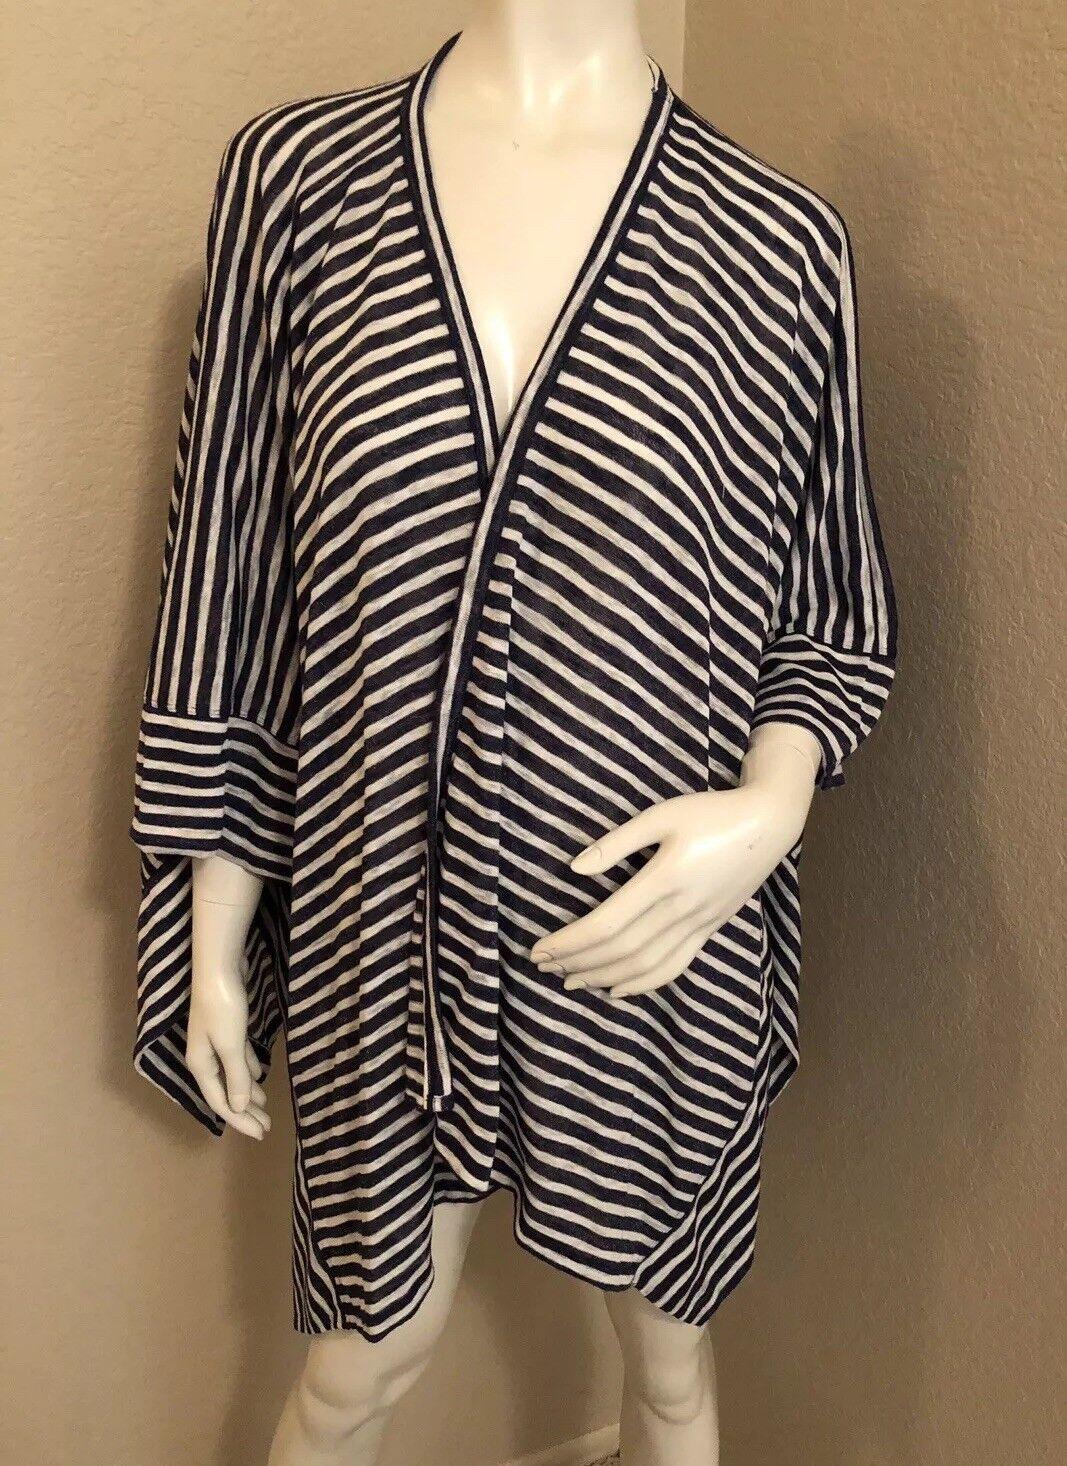 NWT Liz Claiborne Open Front Cardigan Knit bluee & White Striped XL